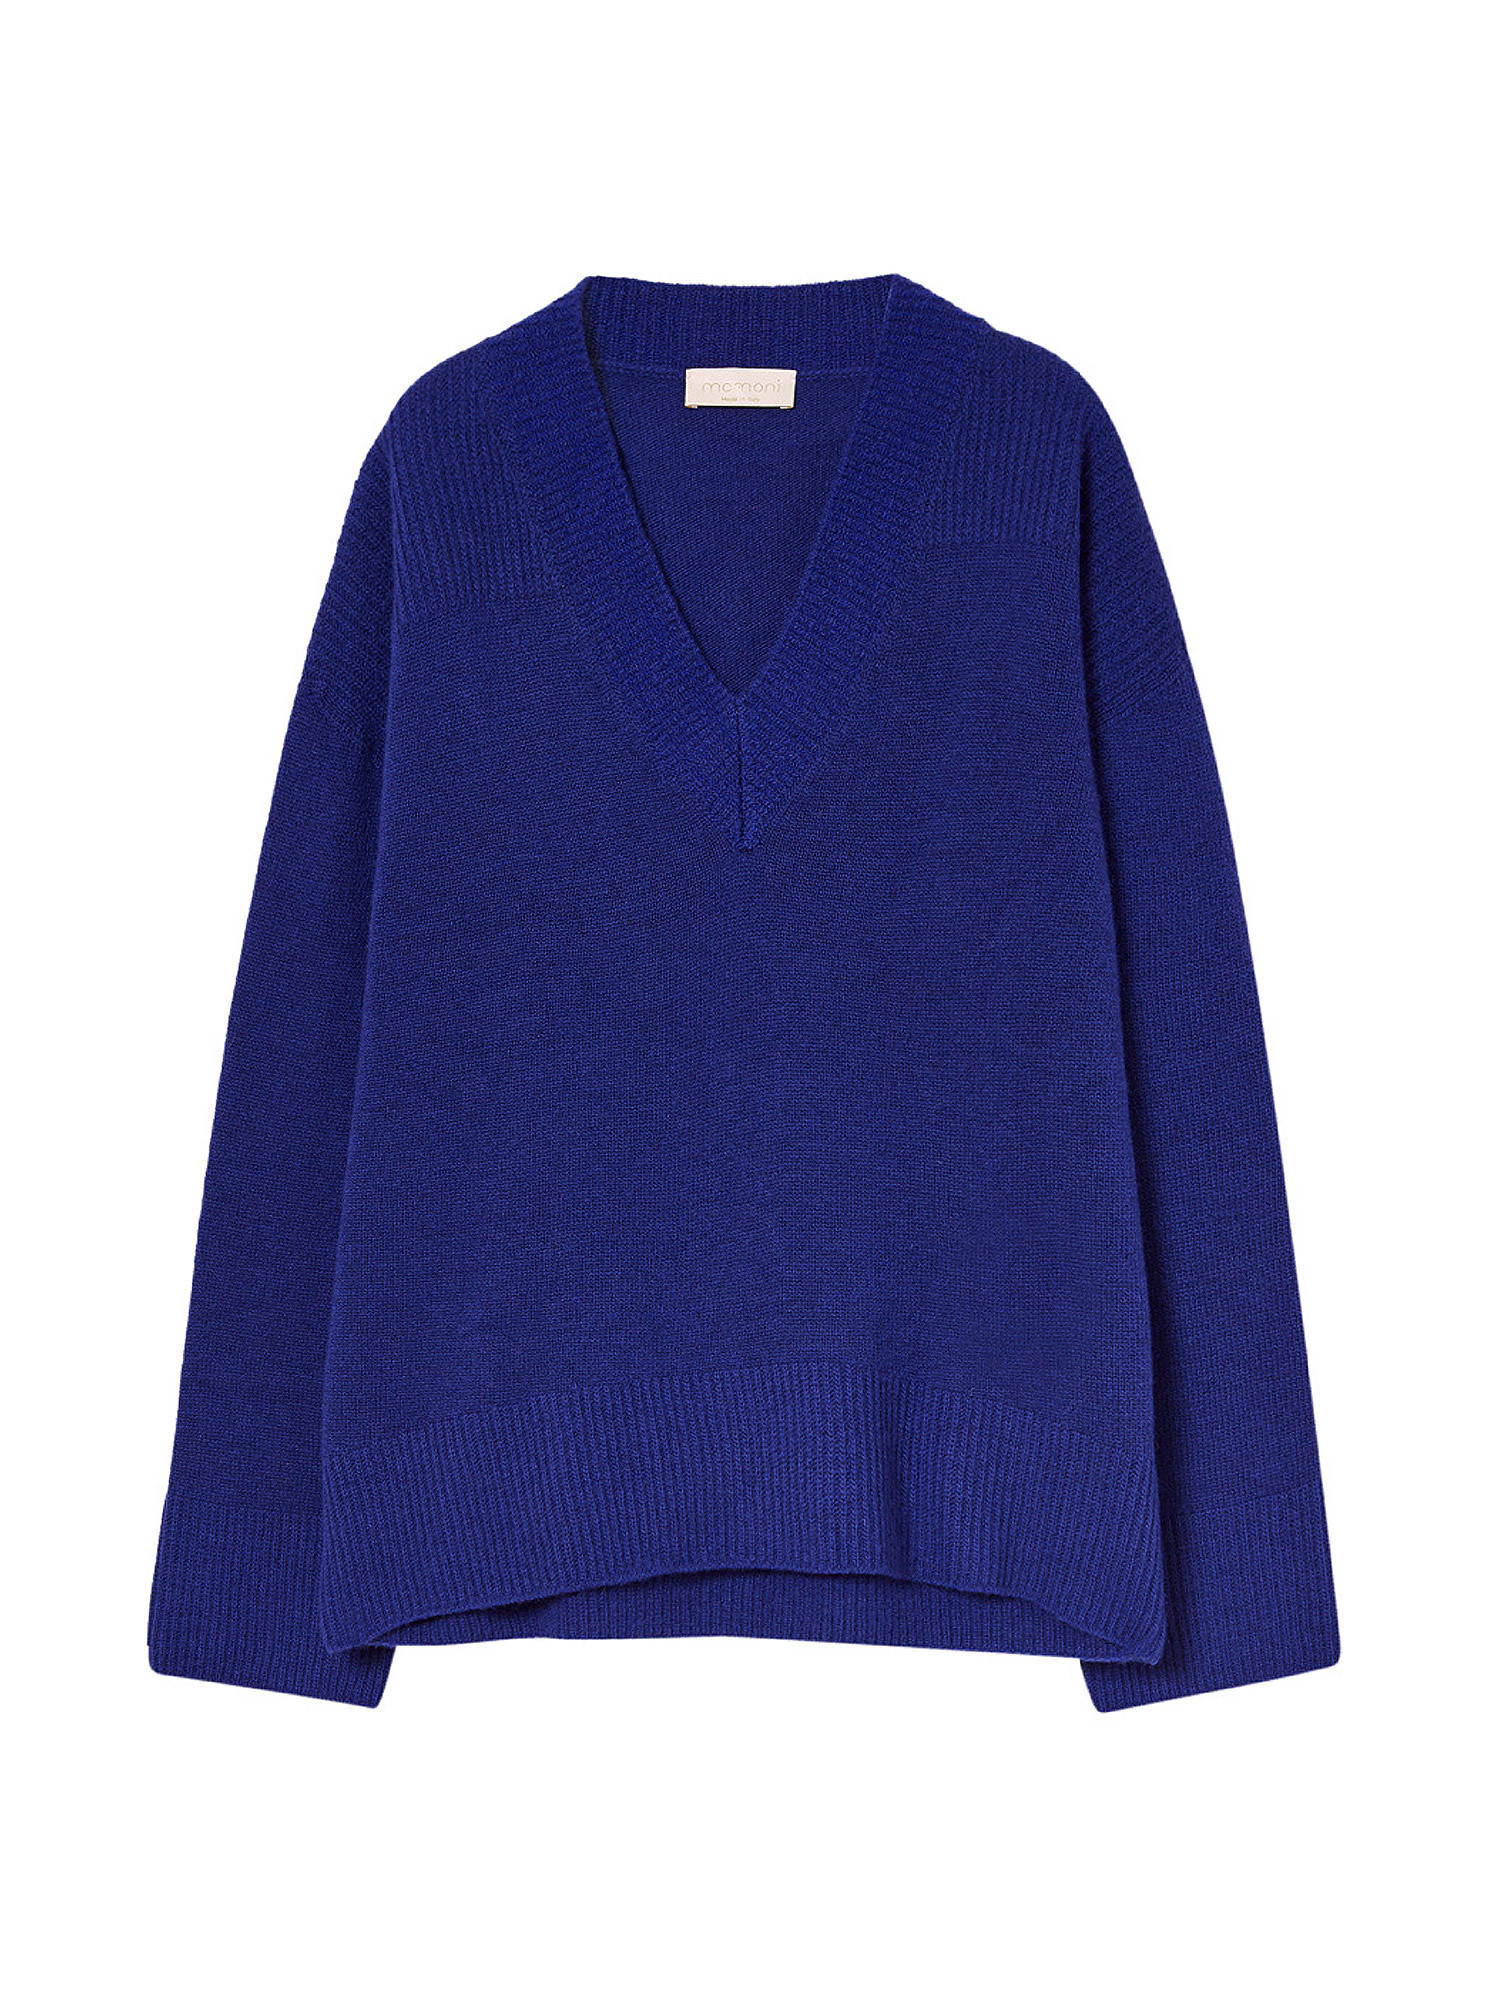 Maglia Voiron in filato di pura lana, Blu, large image number 0